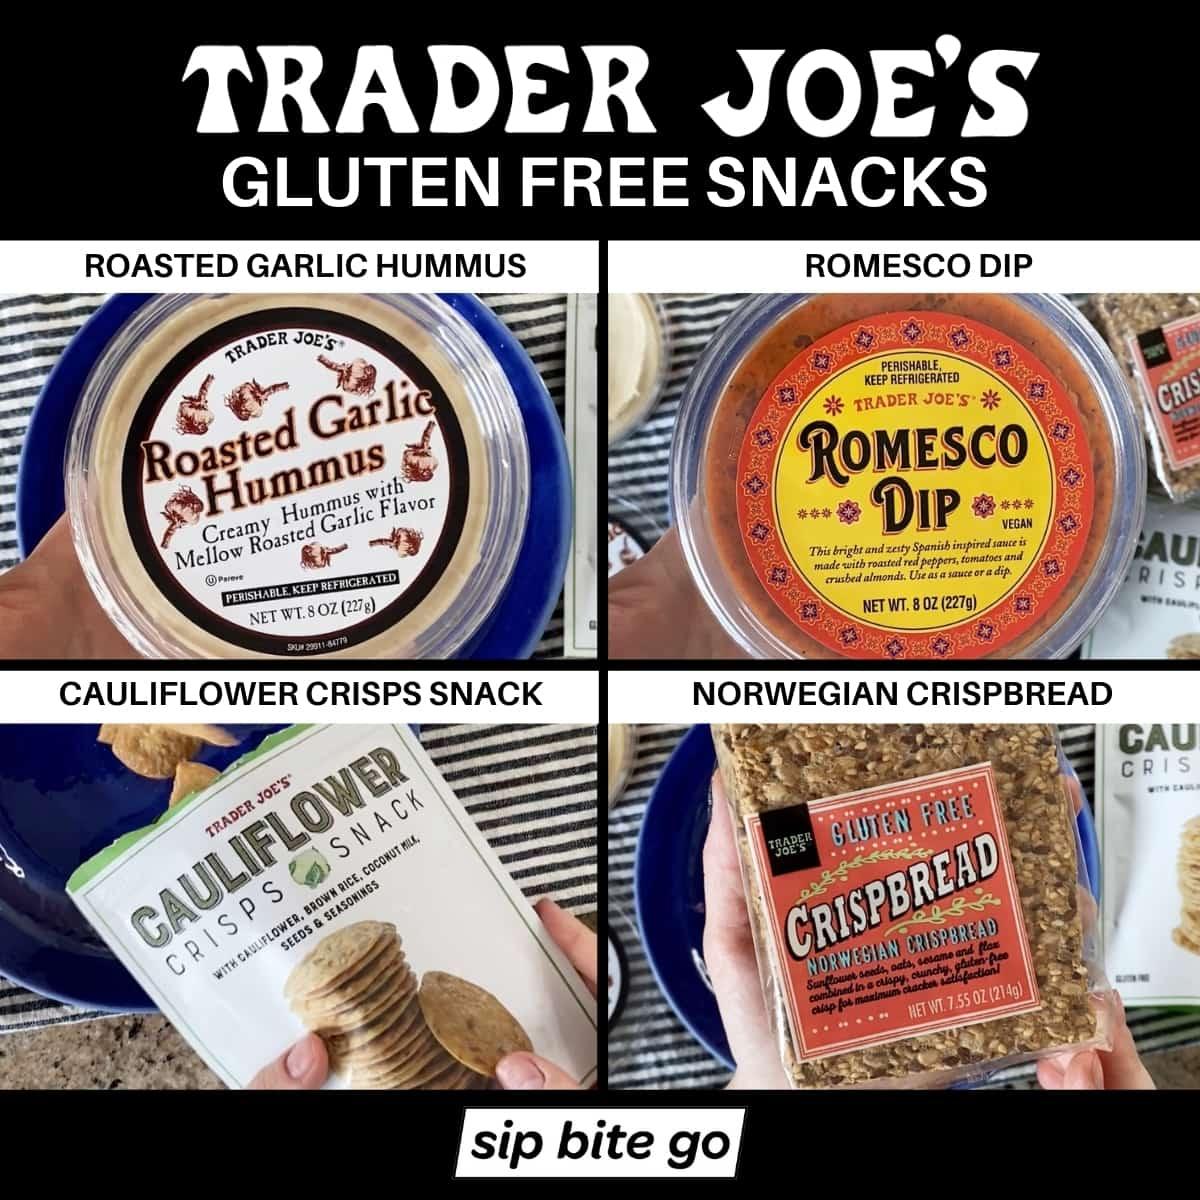 Best Trader Joe's Gluten Free Snacks with hummus, romesco dip, cauliflower crisps snack, and norwegian crispbread.